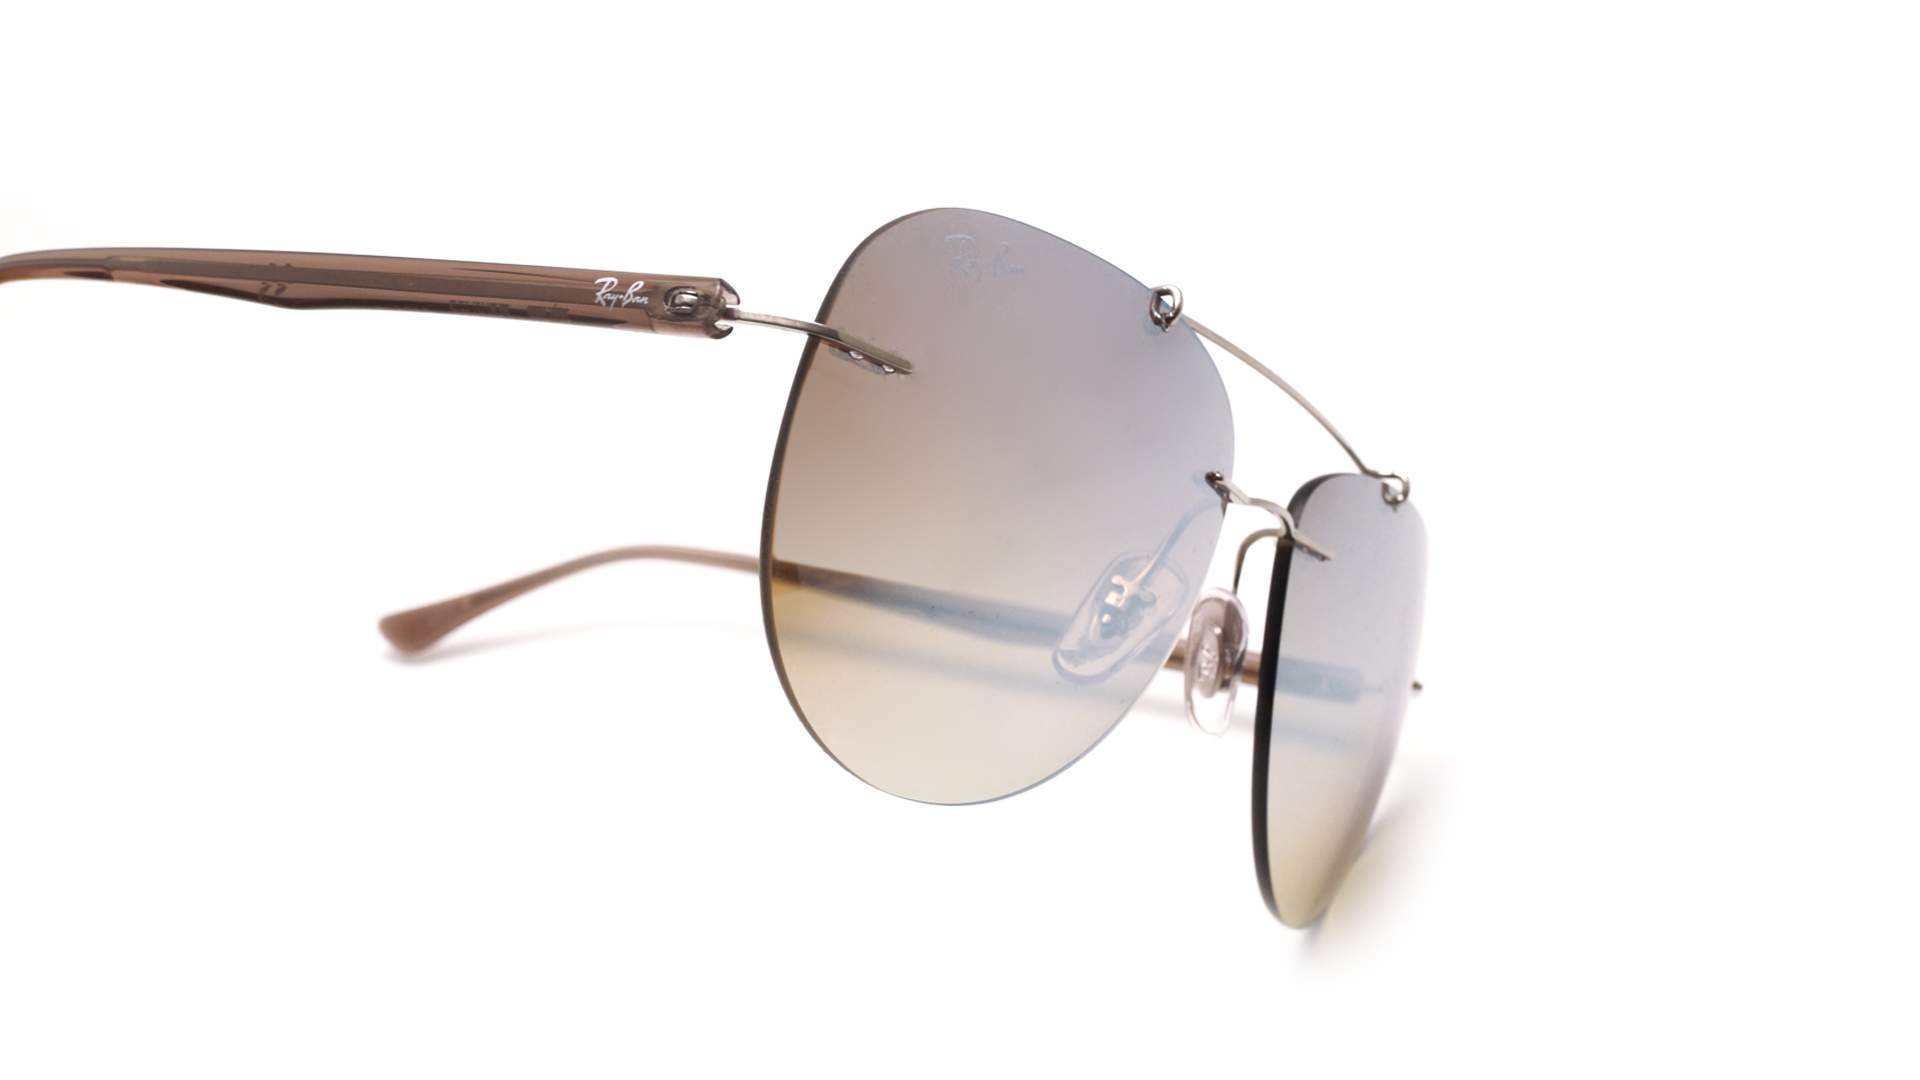 d9299975db Sunglasses Ray-Ban Light ray Silver RB8059 003 B8 57-16 Medium Gradient  Mirror